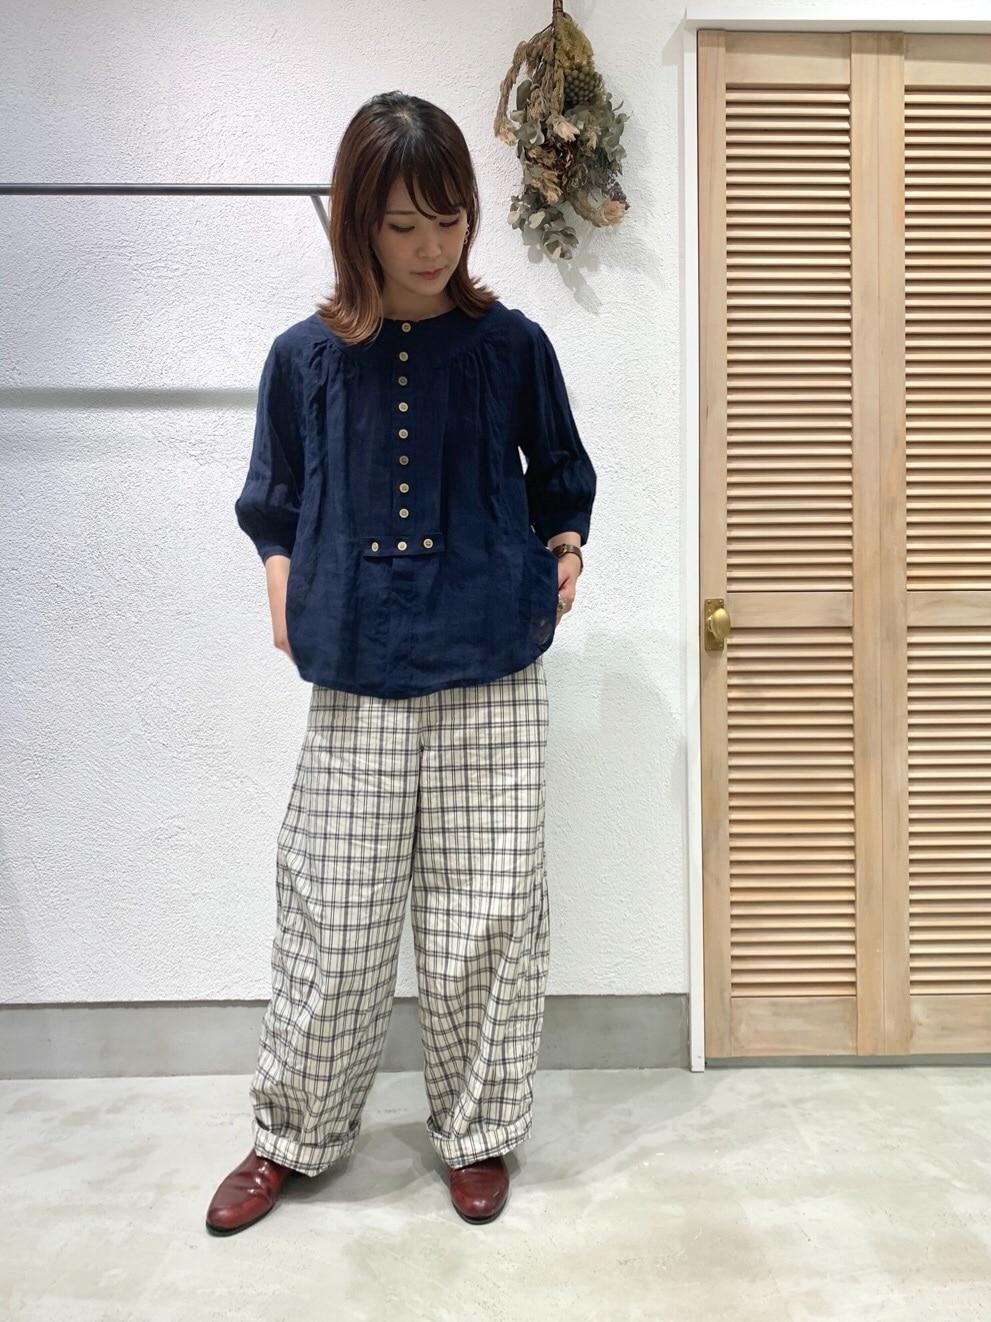 chambre de charme 横浜ジョイナス 身長:162cm 2020.07.22